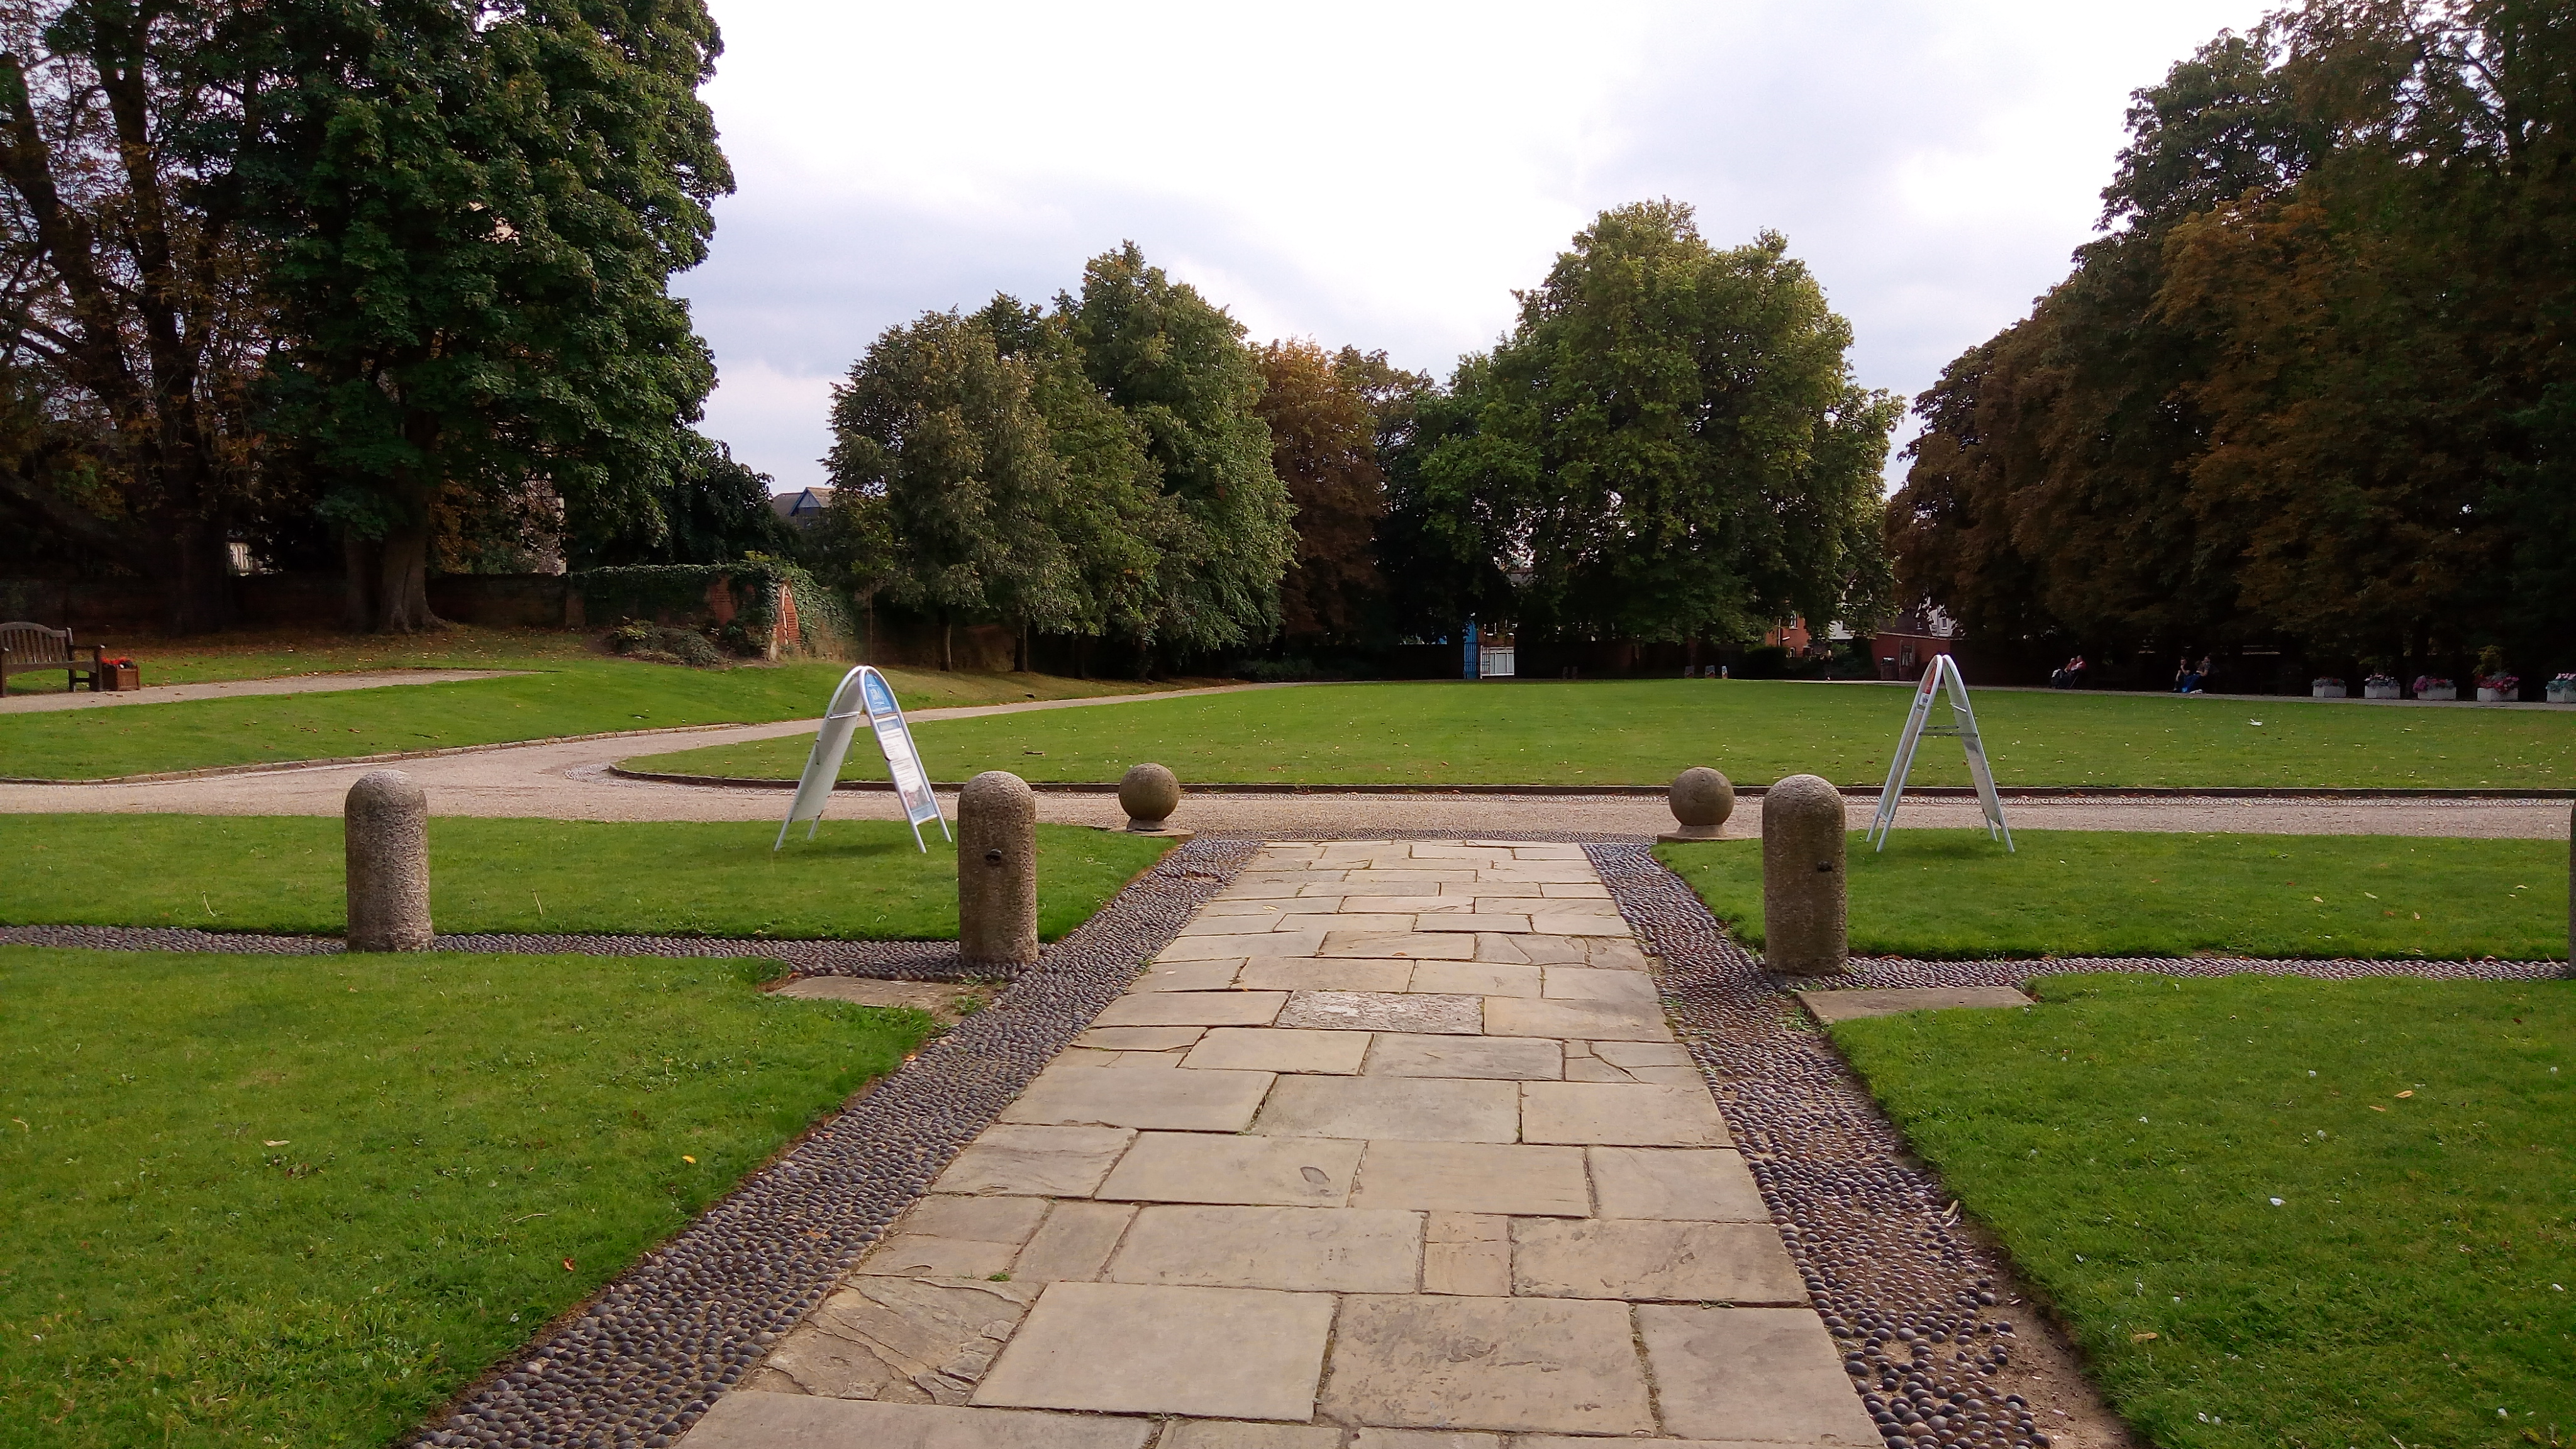 The Christchurch Park